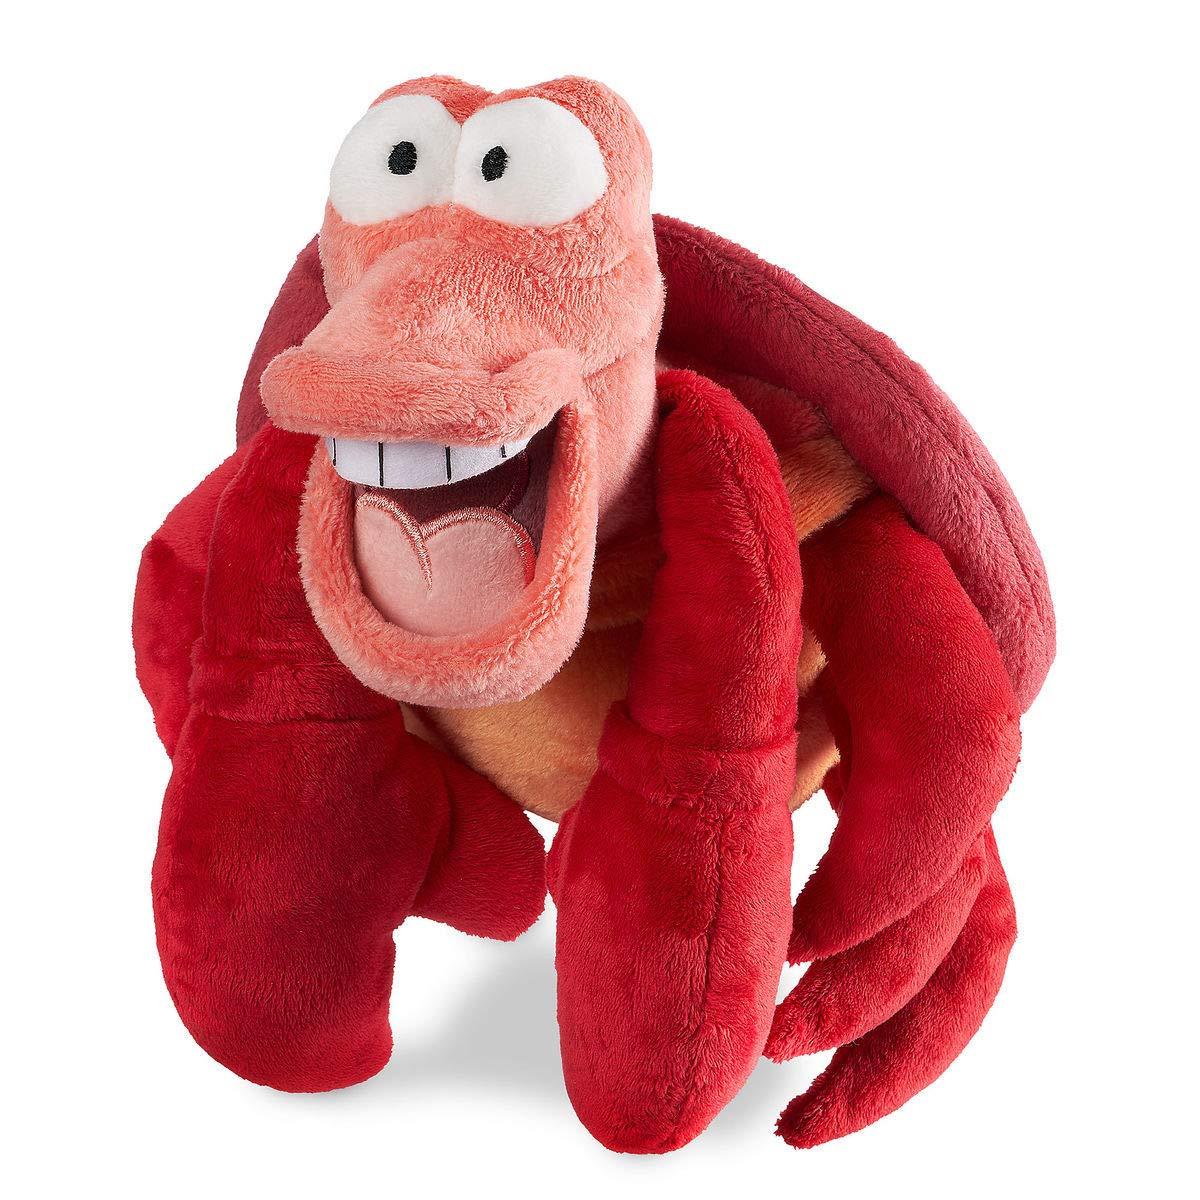 Amazon.com  Disney Store Exclusive Little Mermaid Sebastian The Crab Plush  10 inch  Toys   Games db20fee08